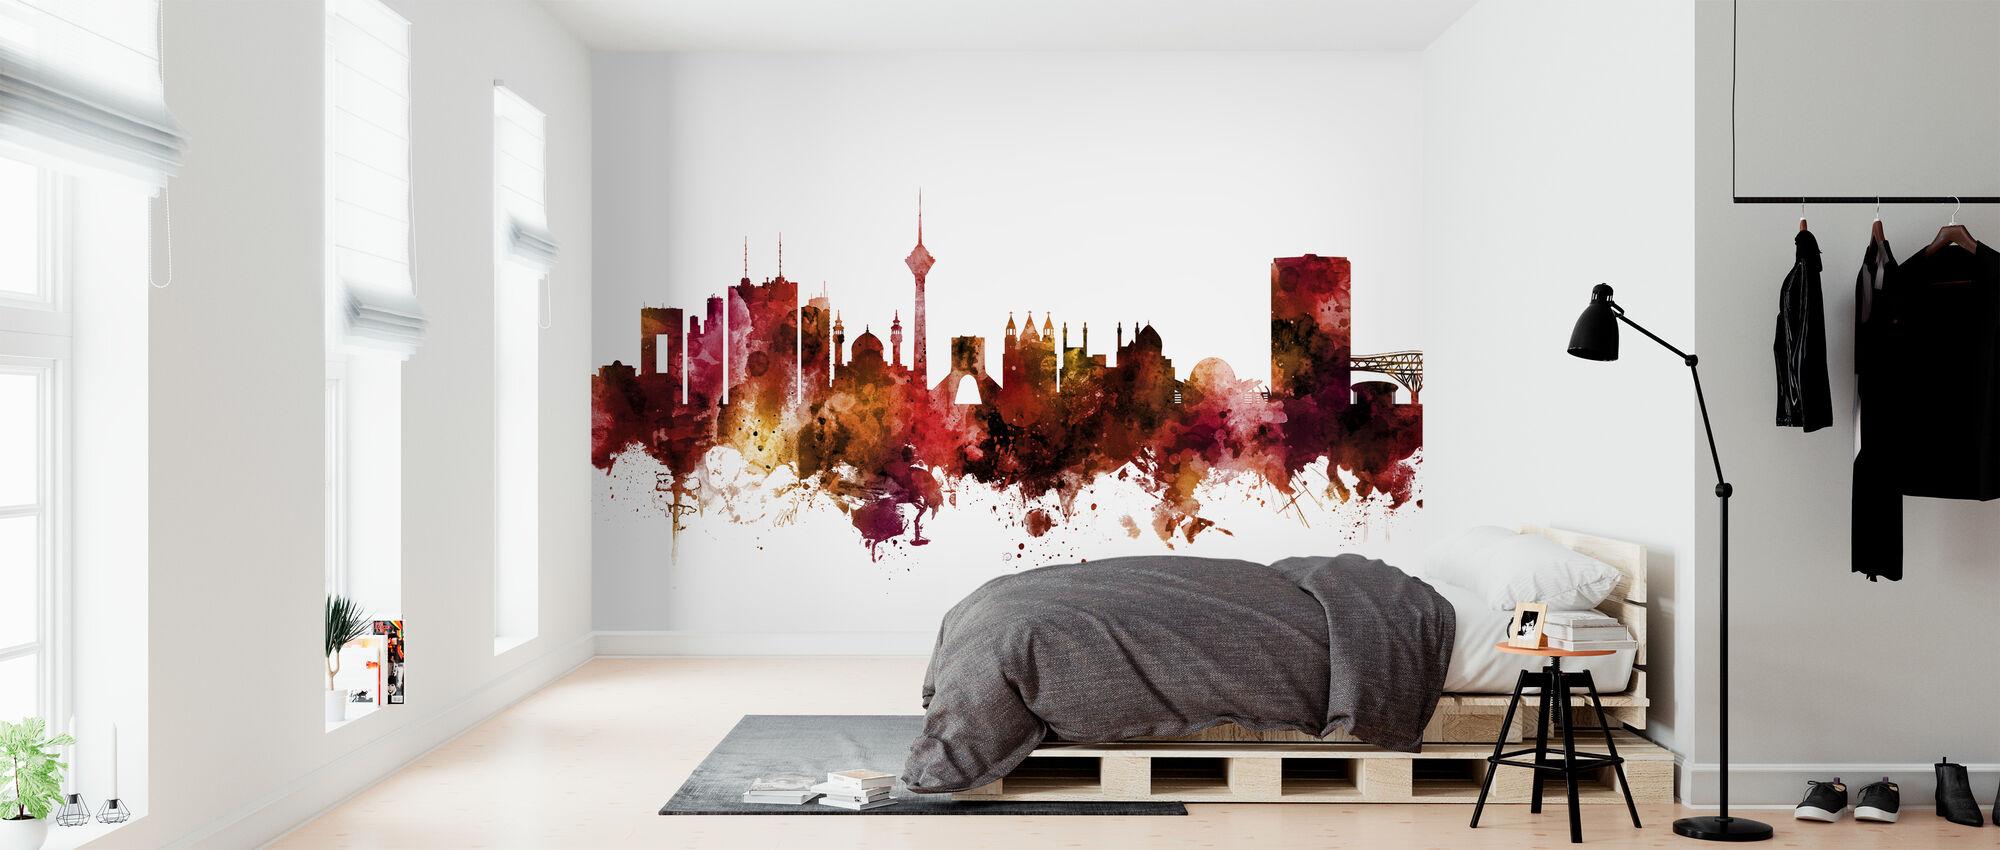 Tehran Iran Skyline - Wallpaper - Bedroom